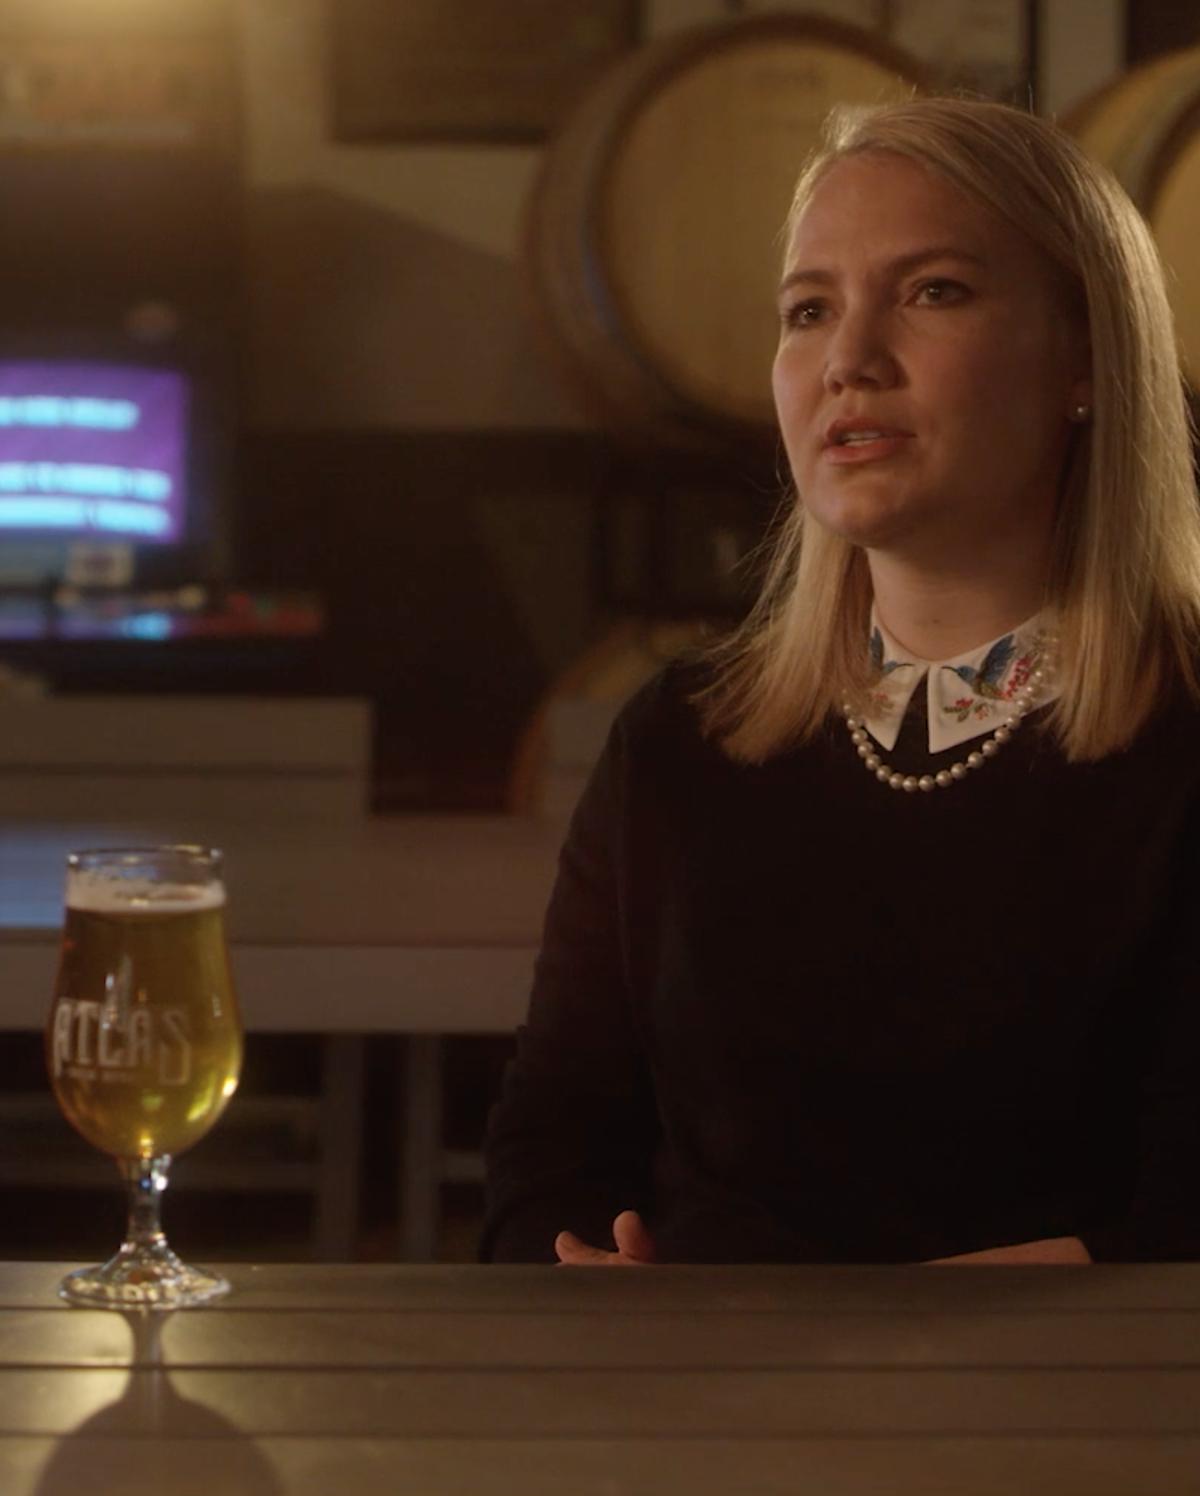 Documentary short on American craft beer